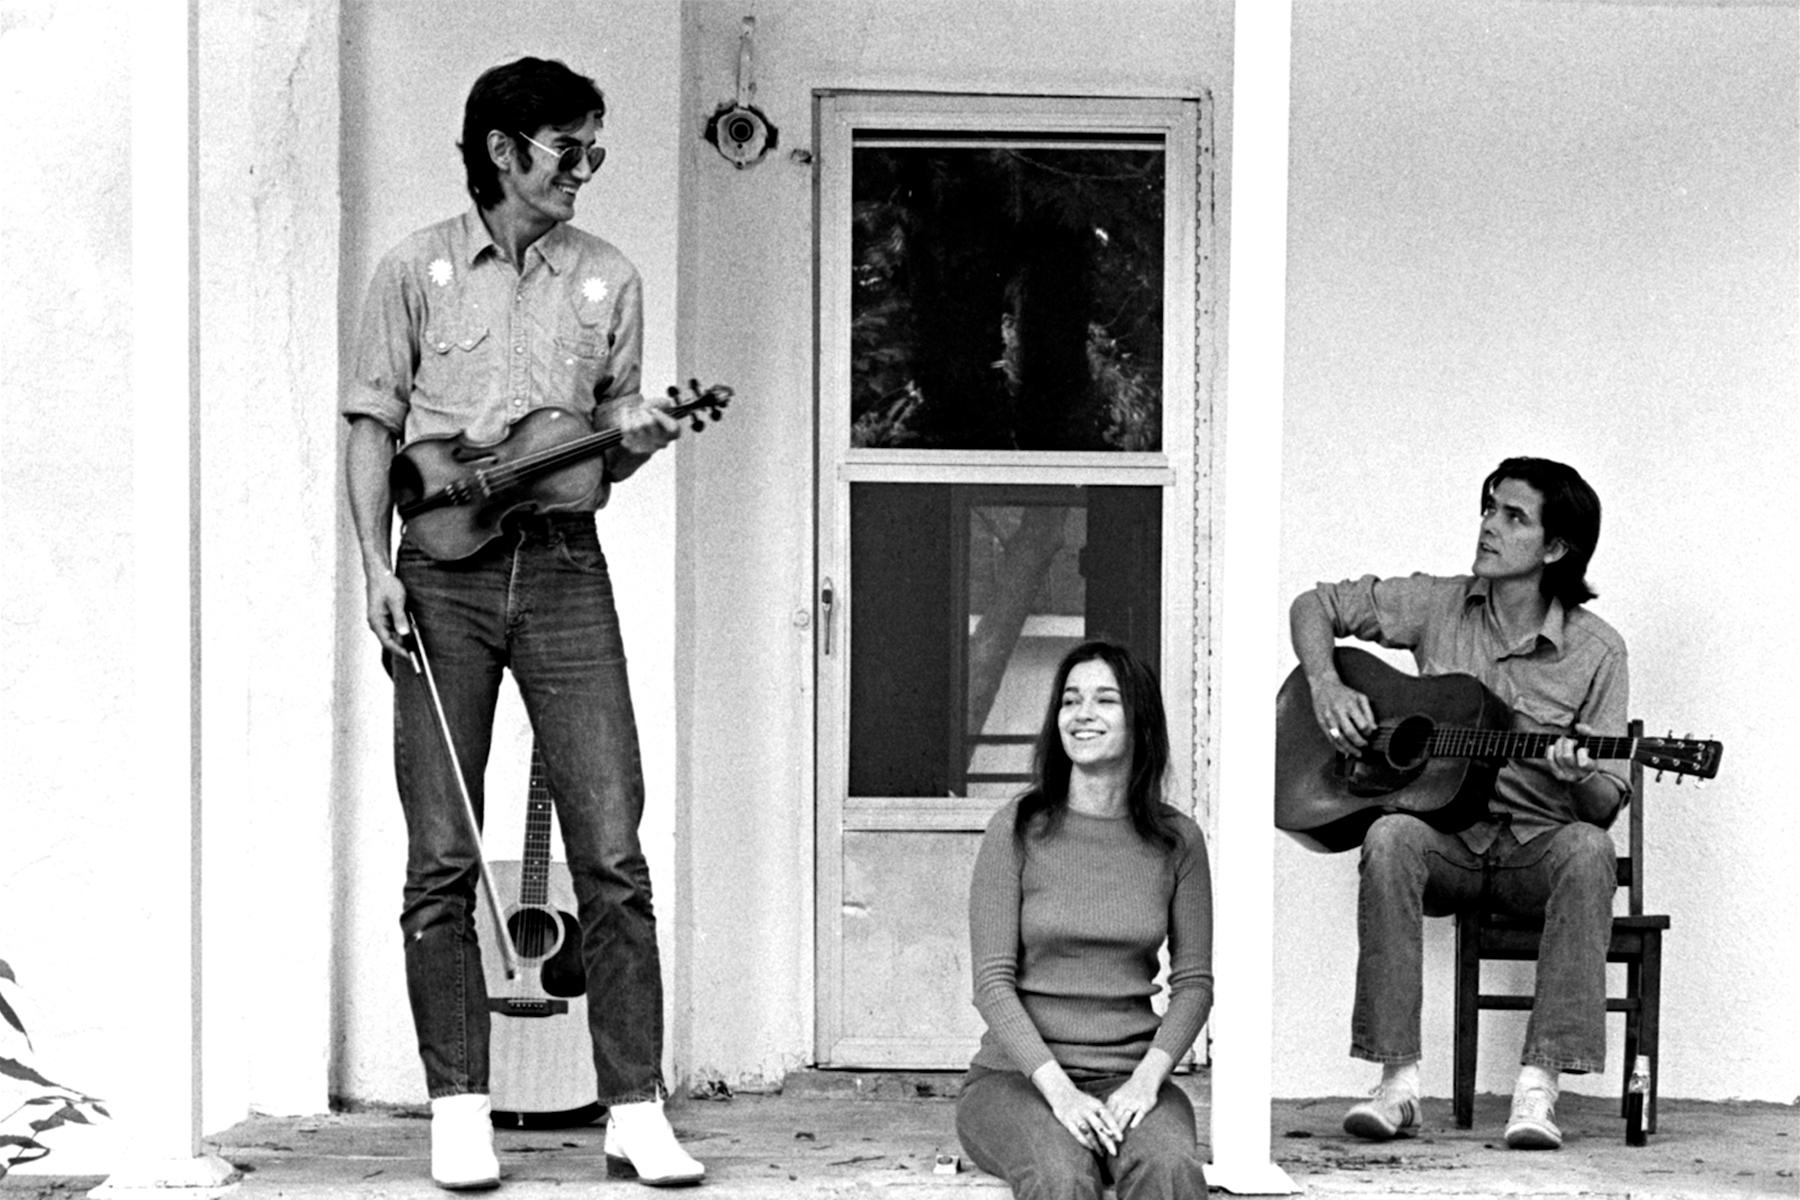 Townes-Van-Zandt-Susanna-Clark-Guy-Clark-Spring-1972-House-on-Chapel-Street-in-East-Nashville-Photo-by-Al-Clayton-1614196450